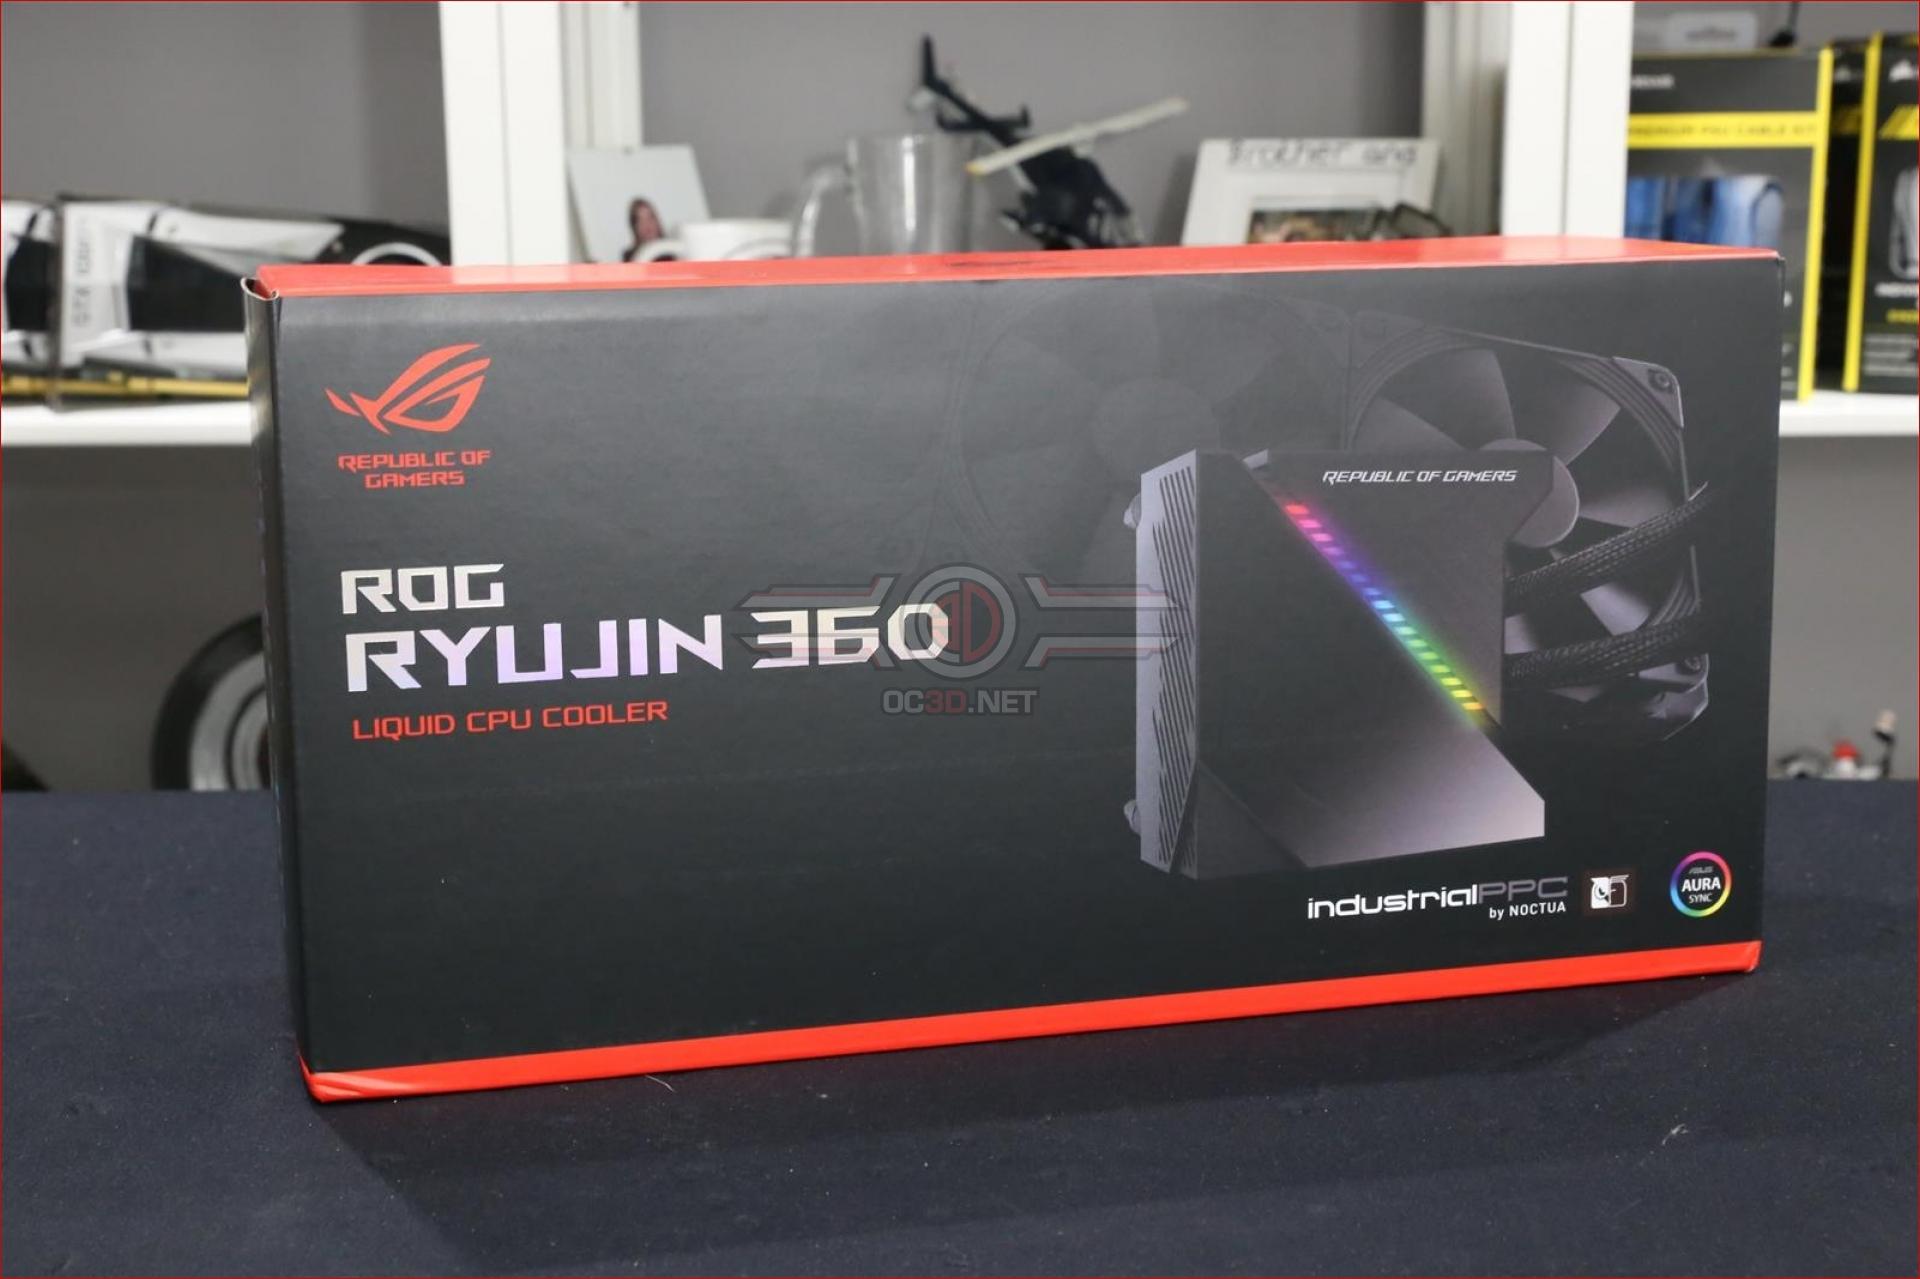 ASUS ROG Ryuo 240 and Ryujin 360 AIO Liquid Cooler Review